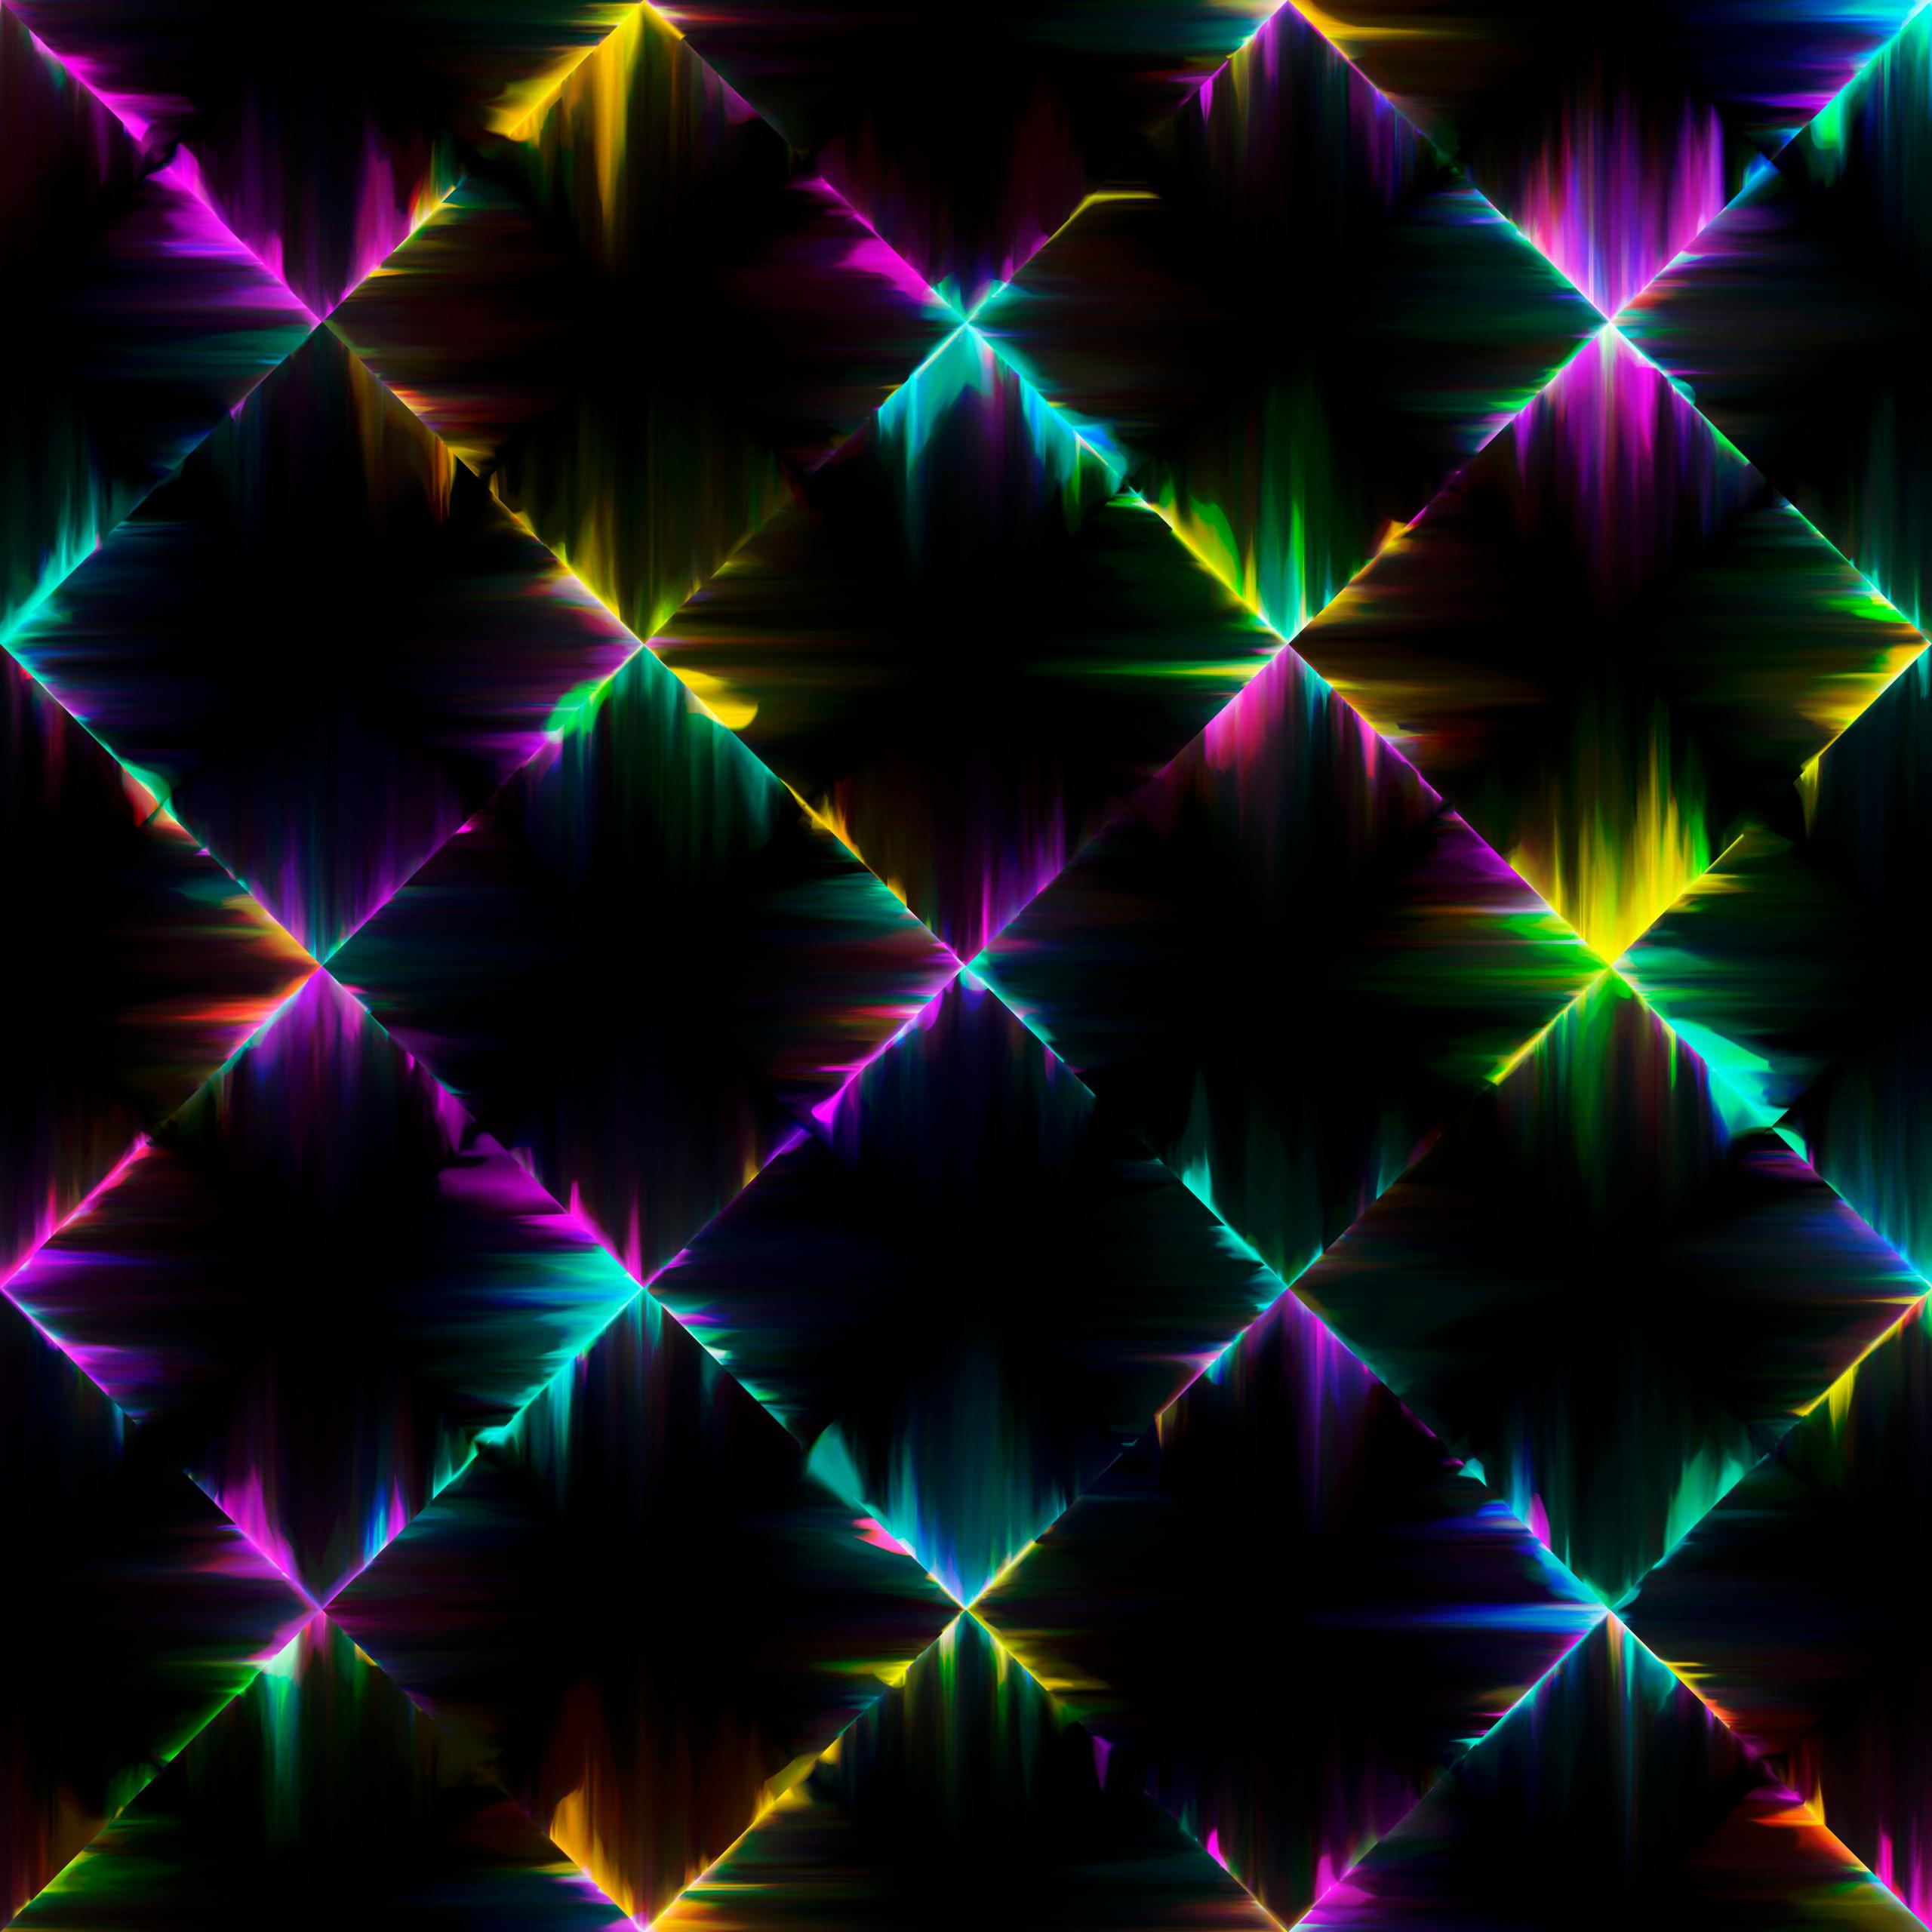 4K Wallpaper Neon Lights, Colorful, Black Background